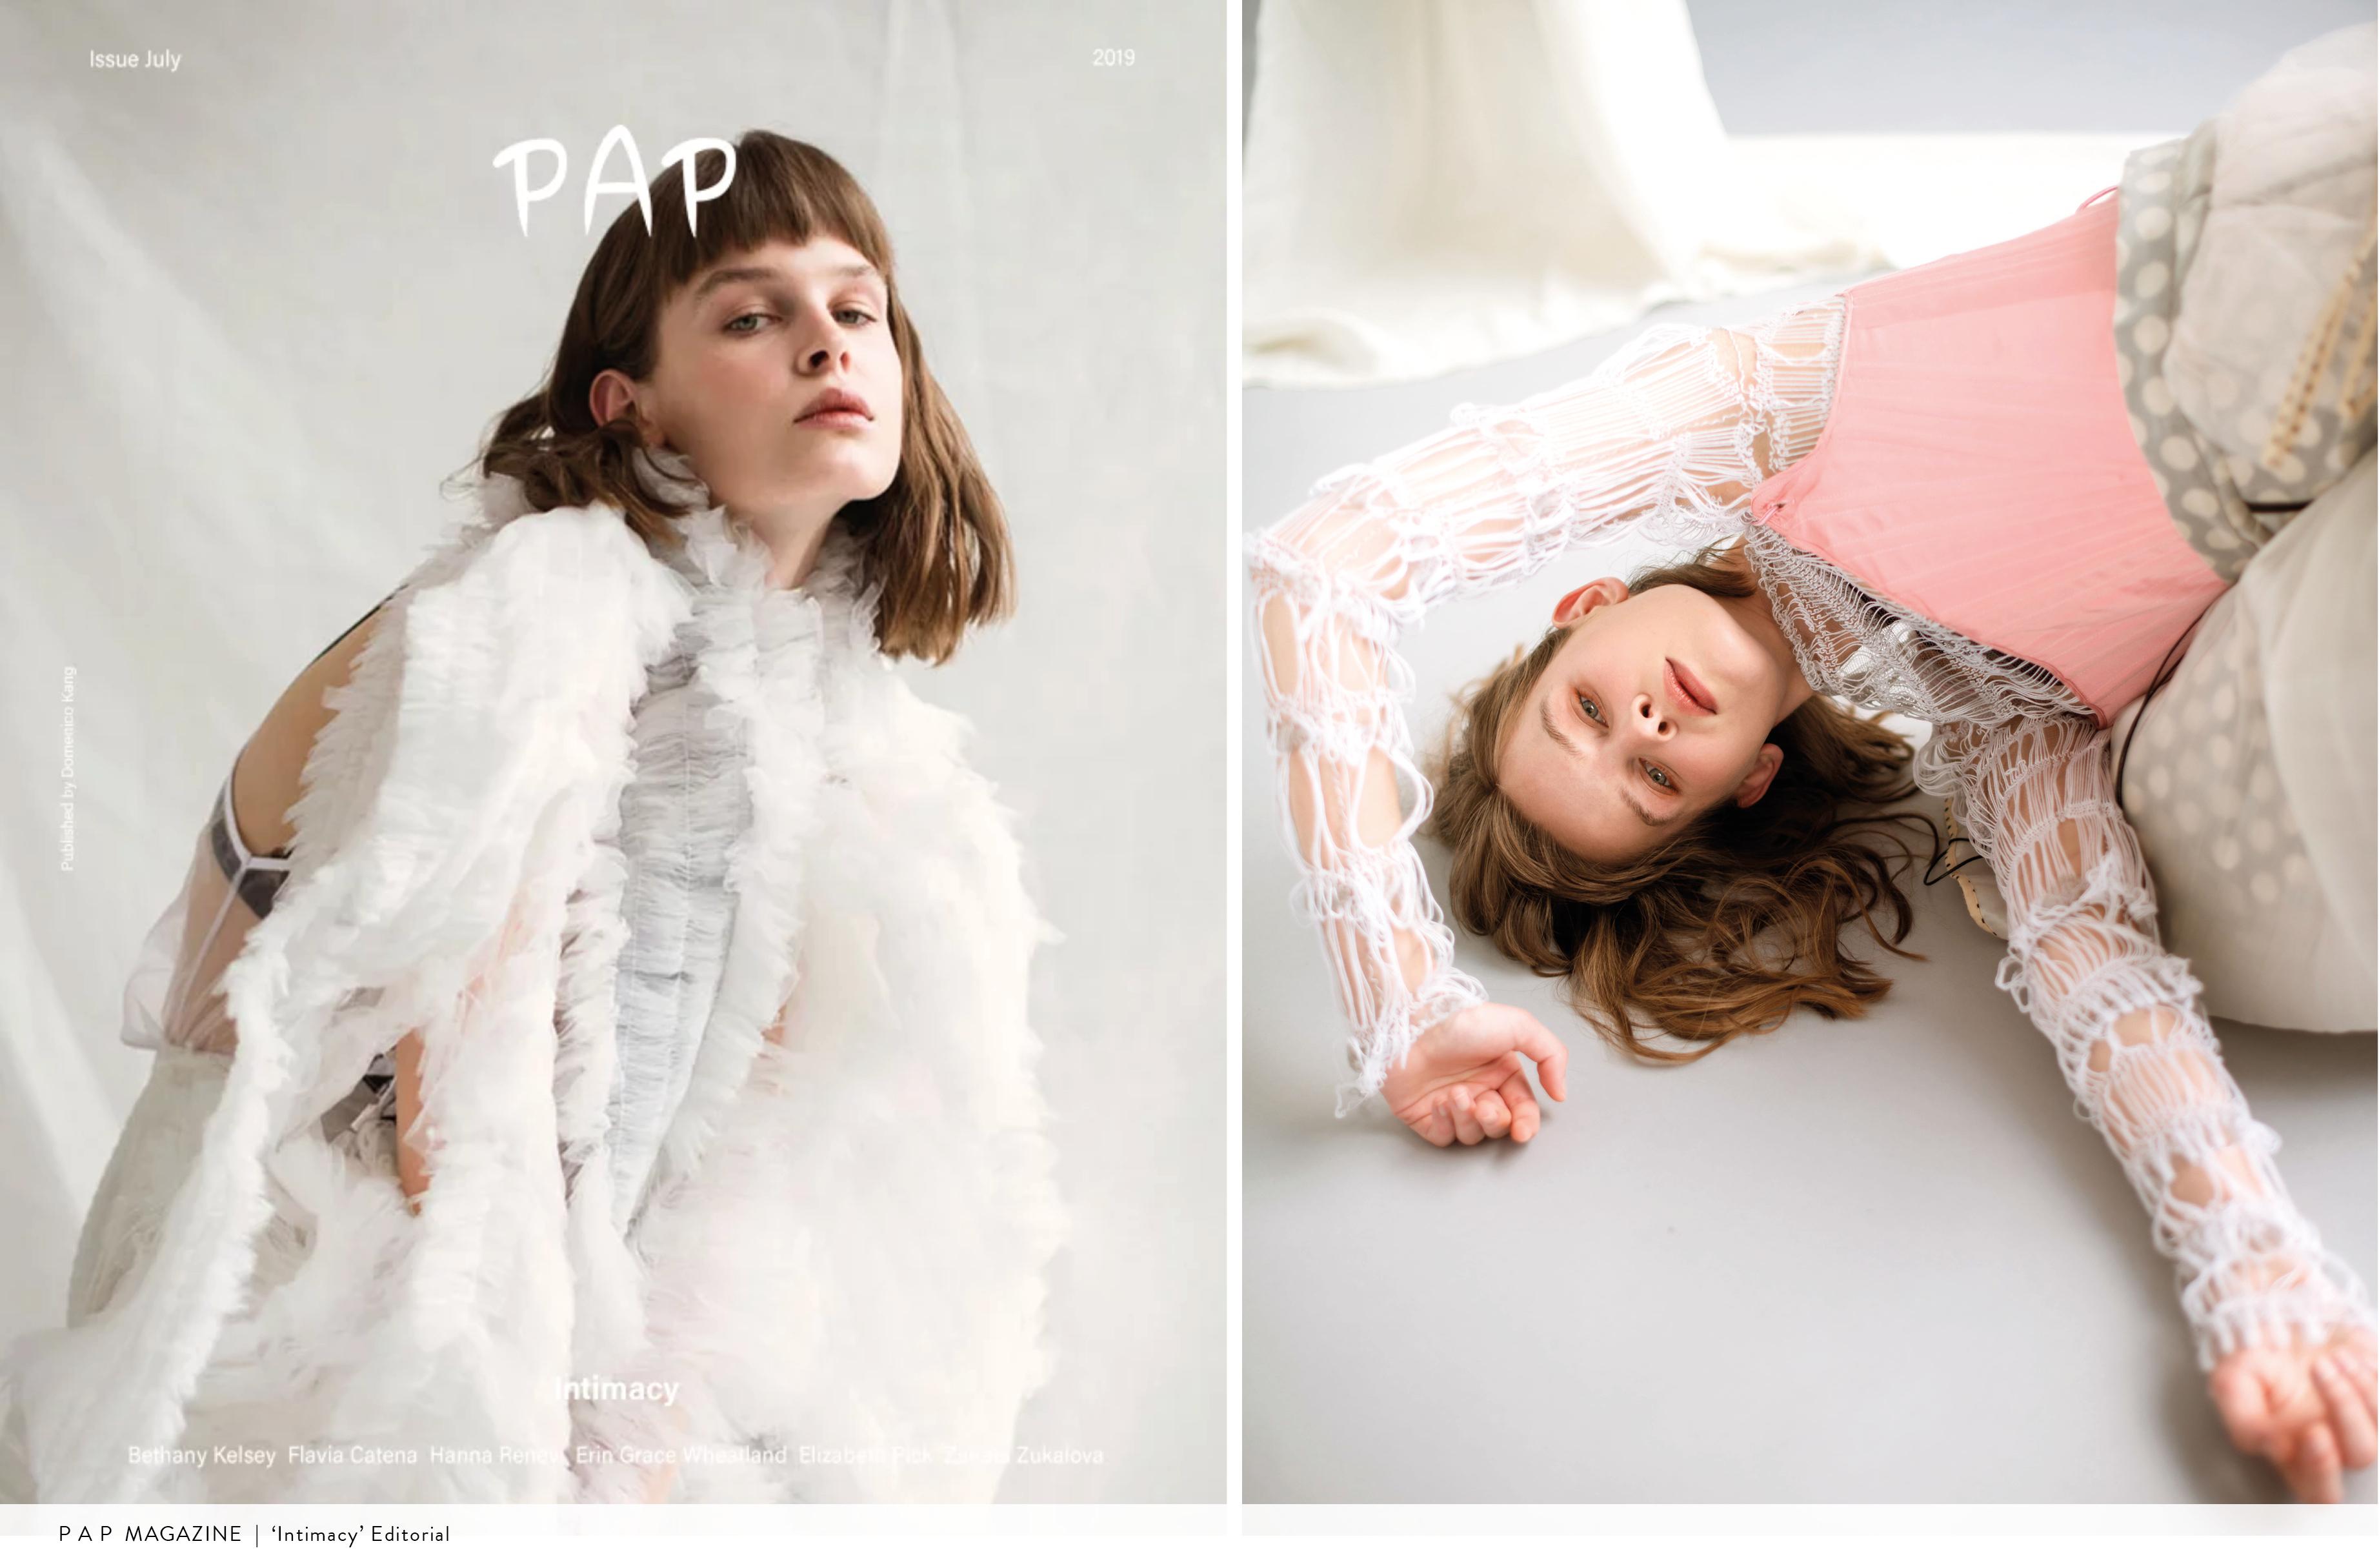 PAP Magazine | 'Intimacy' Editorial